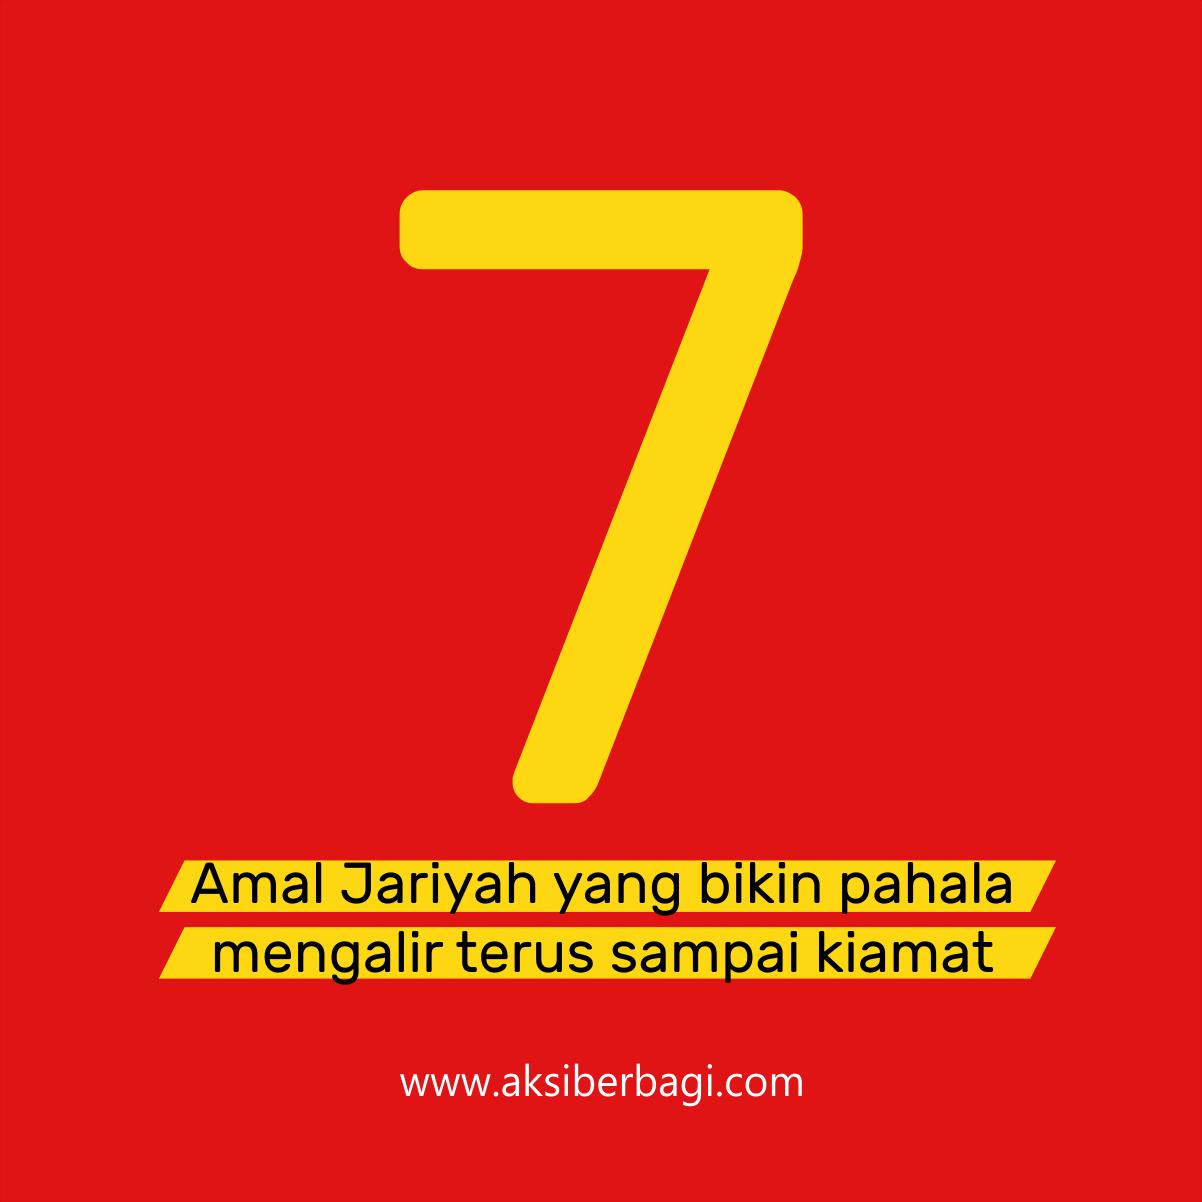 7 Amal Jariyah yang Bikin Pahala Terus Mengalir Sampai Kiamat